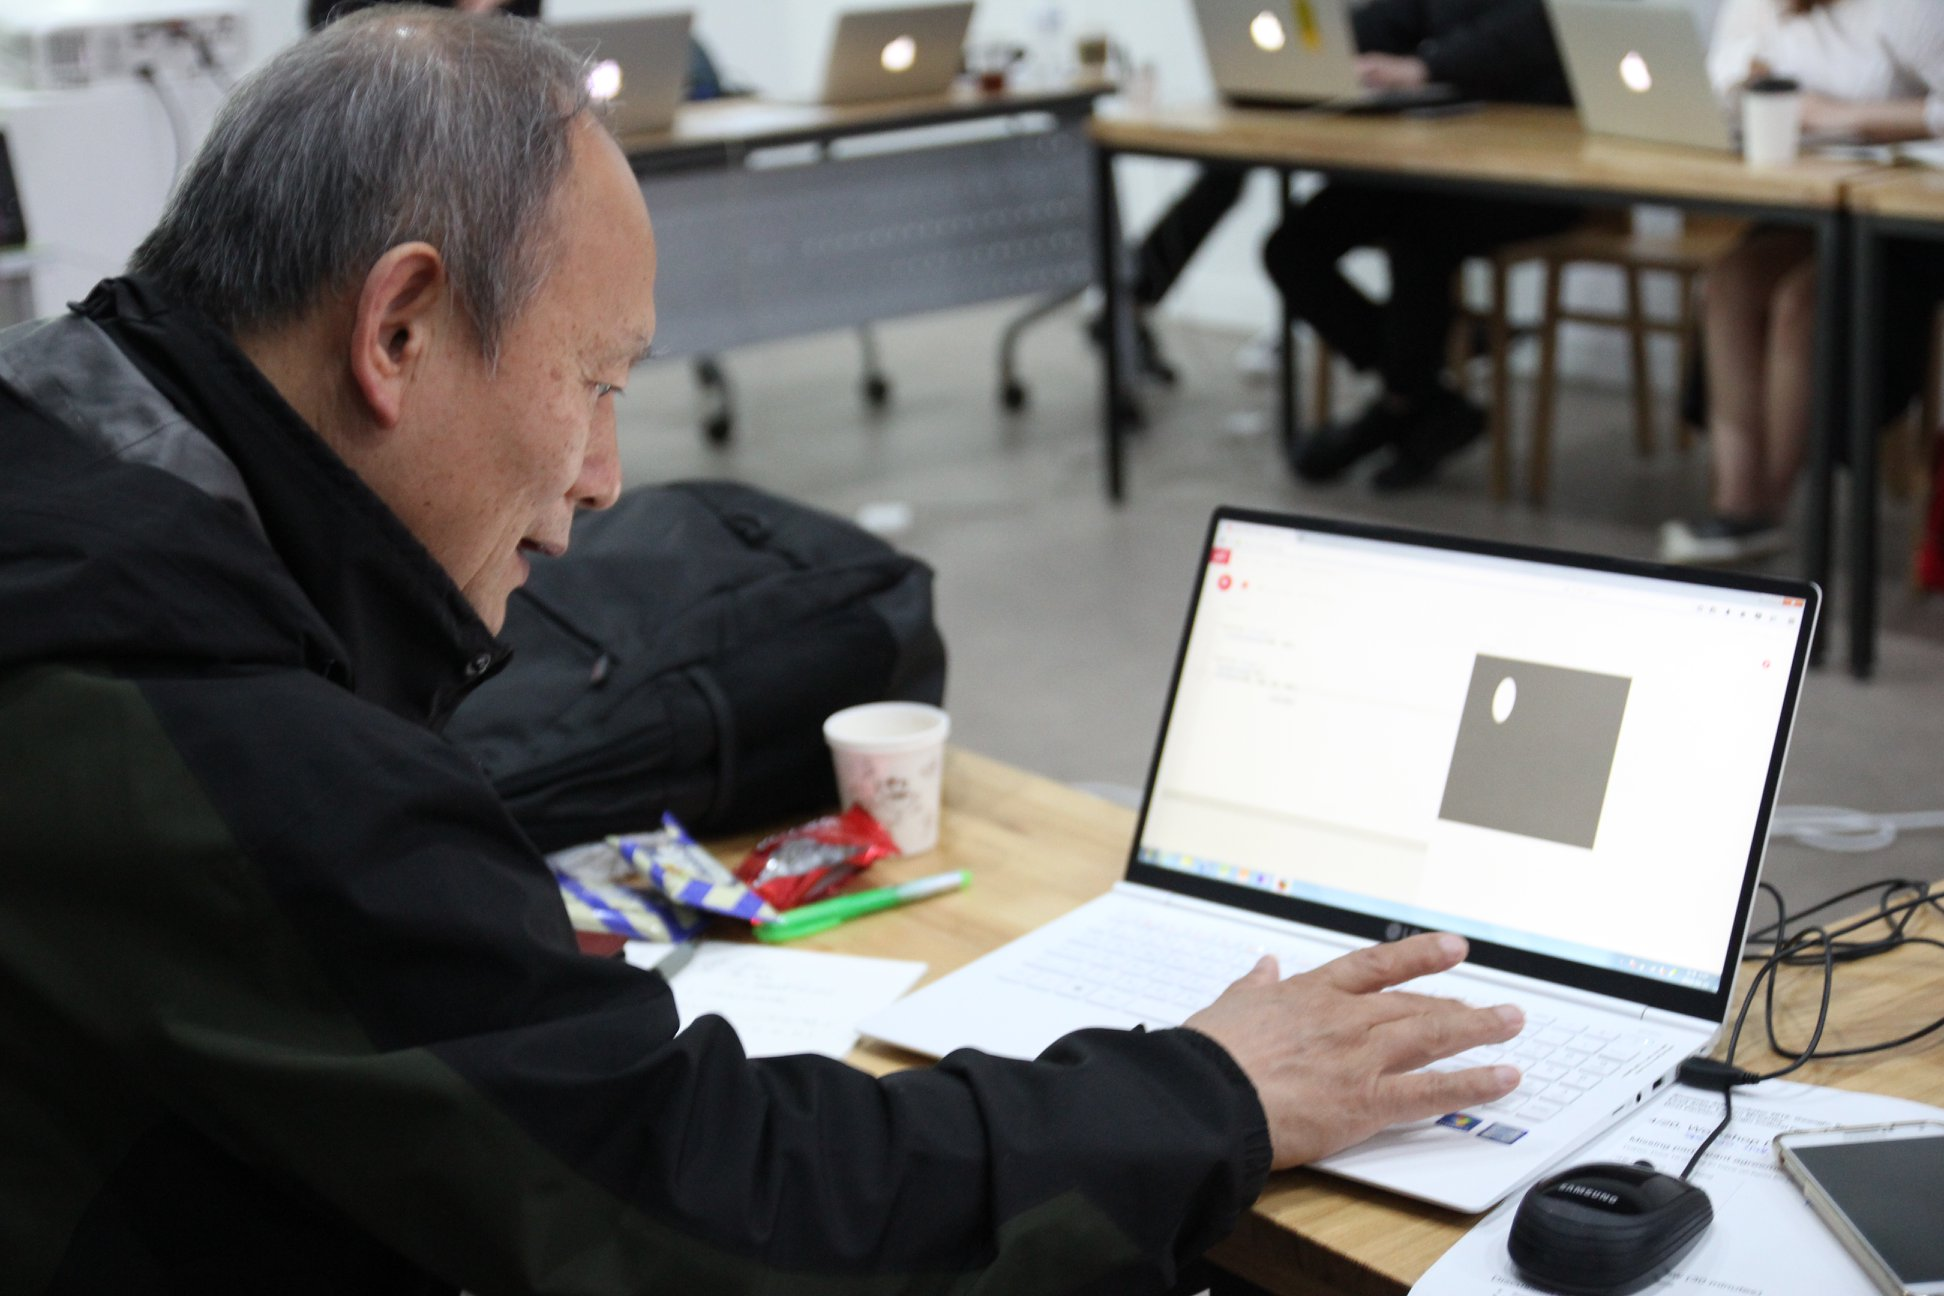 Man looks at computer screen creating a circle with code